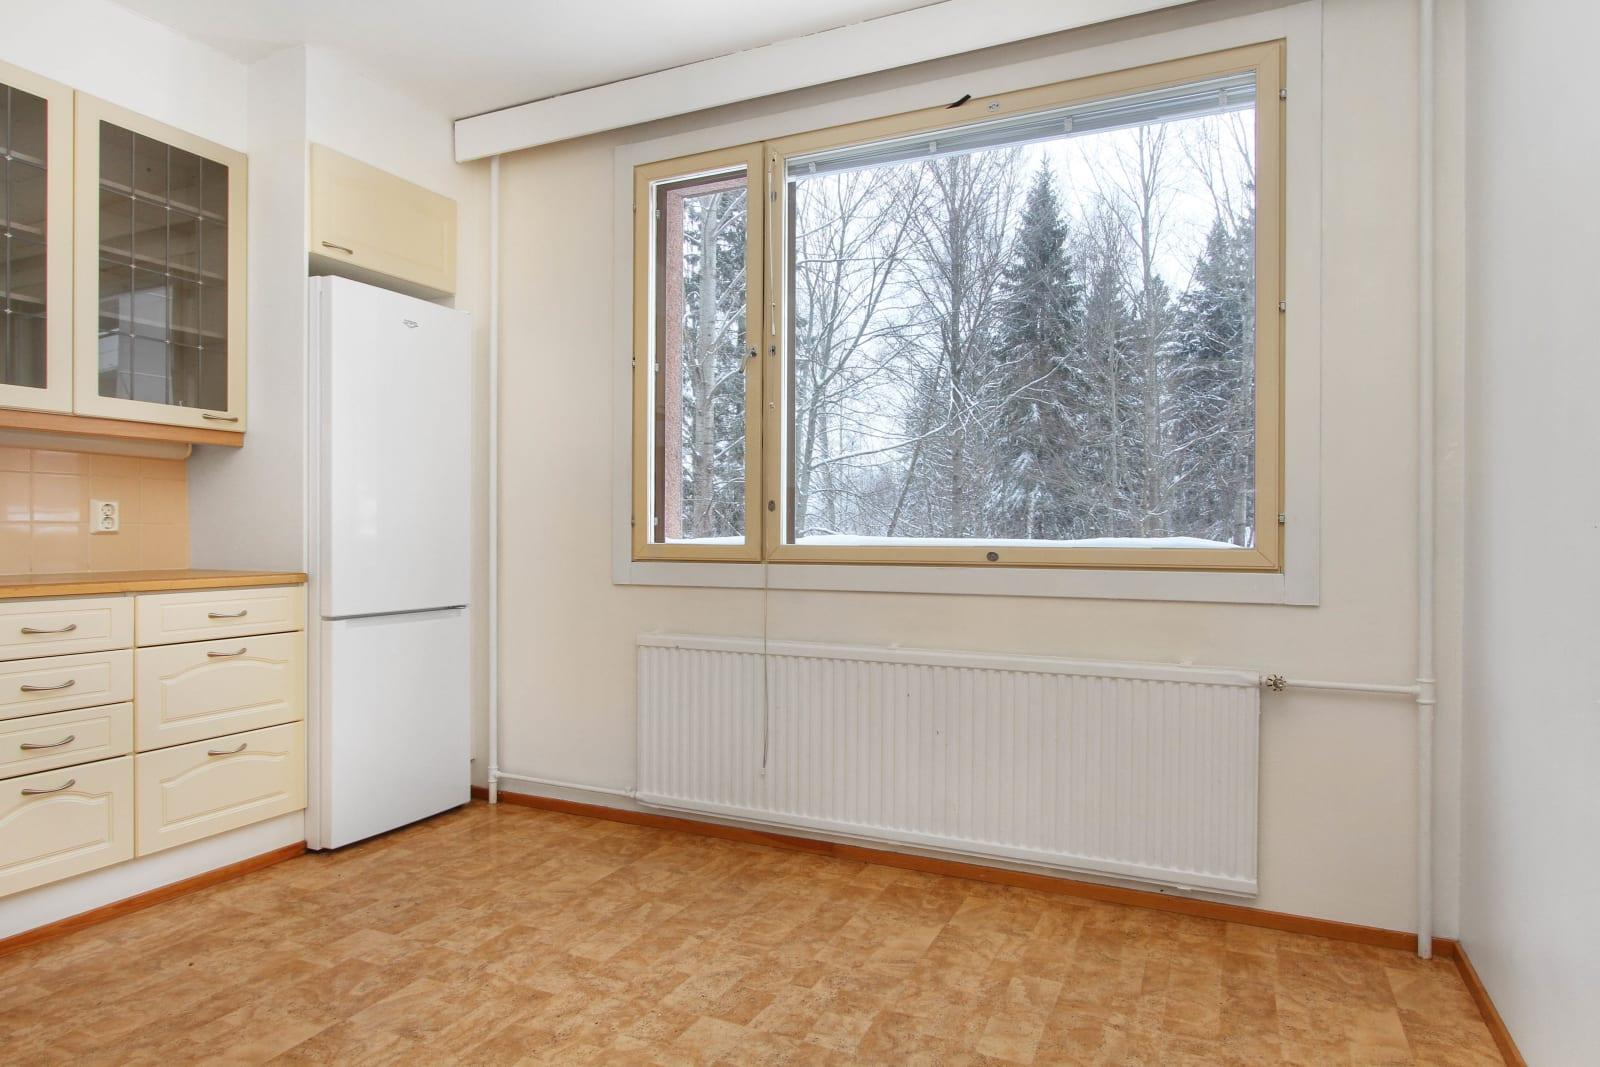 Vantaa, Hakunila, Heporinne 4